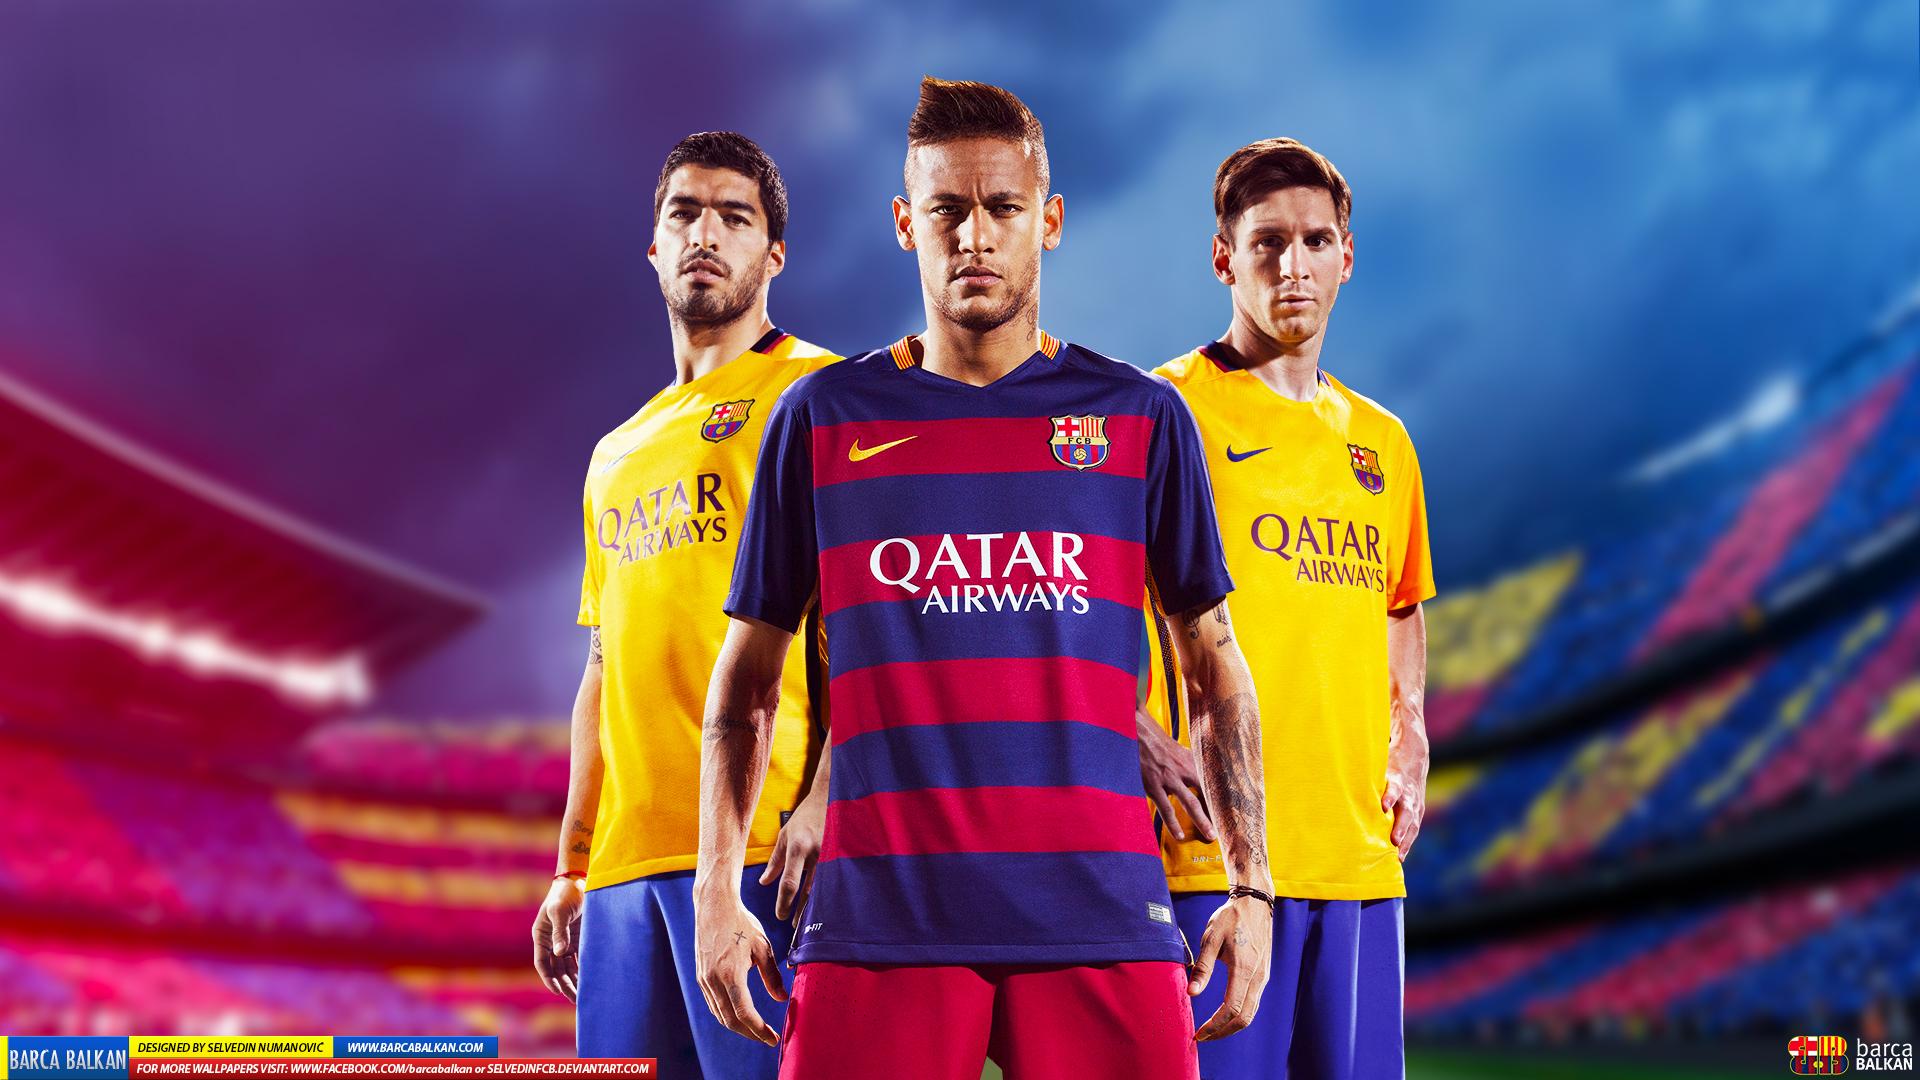 Neymar Wallpaper HD 2016 - WallpaperSafari